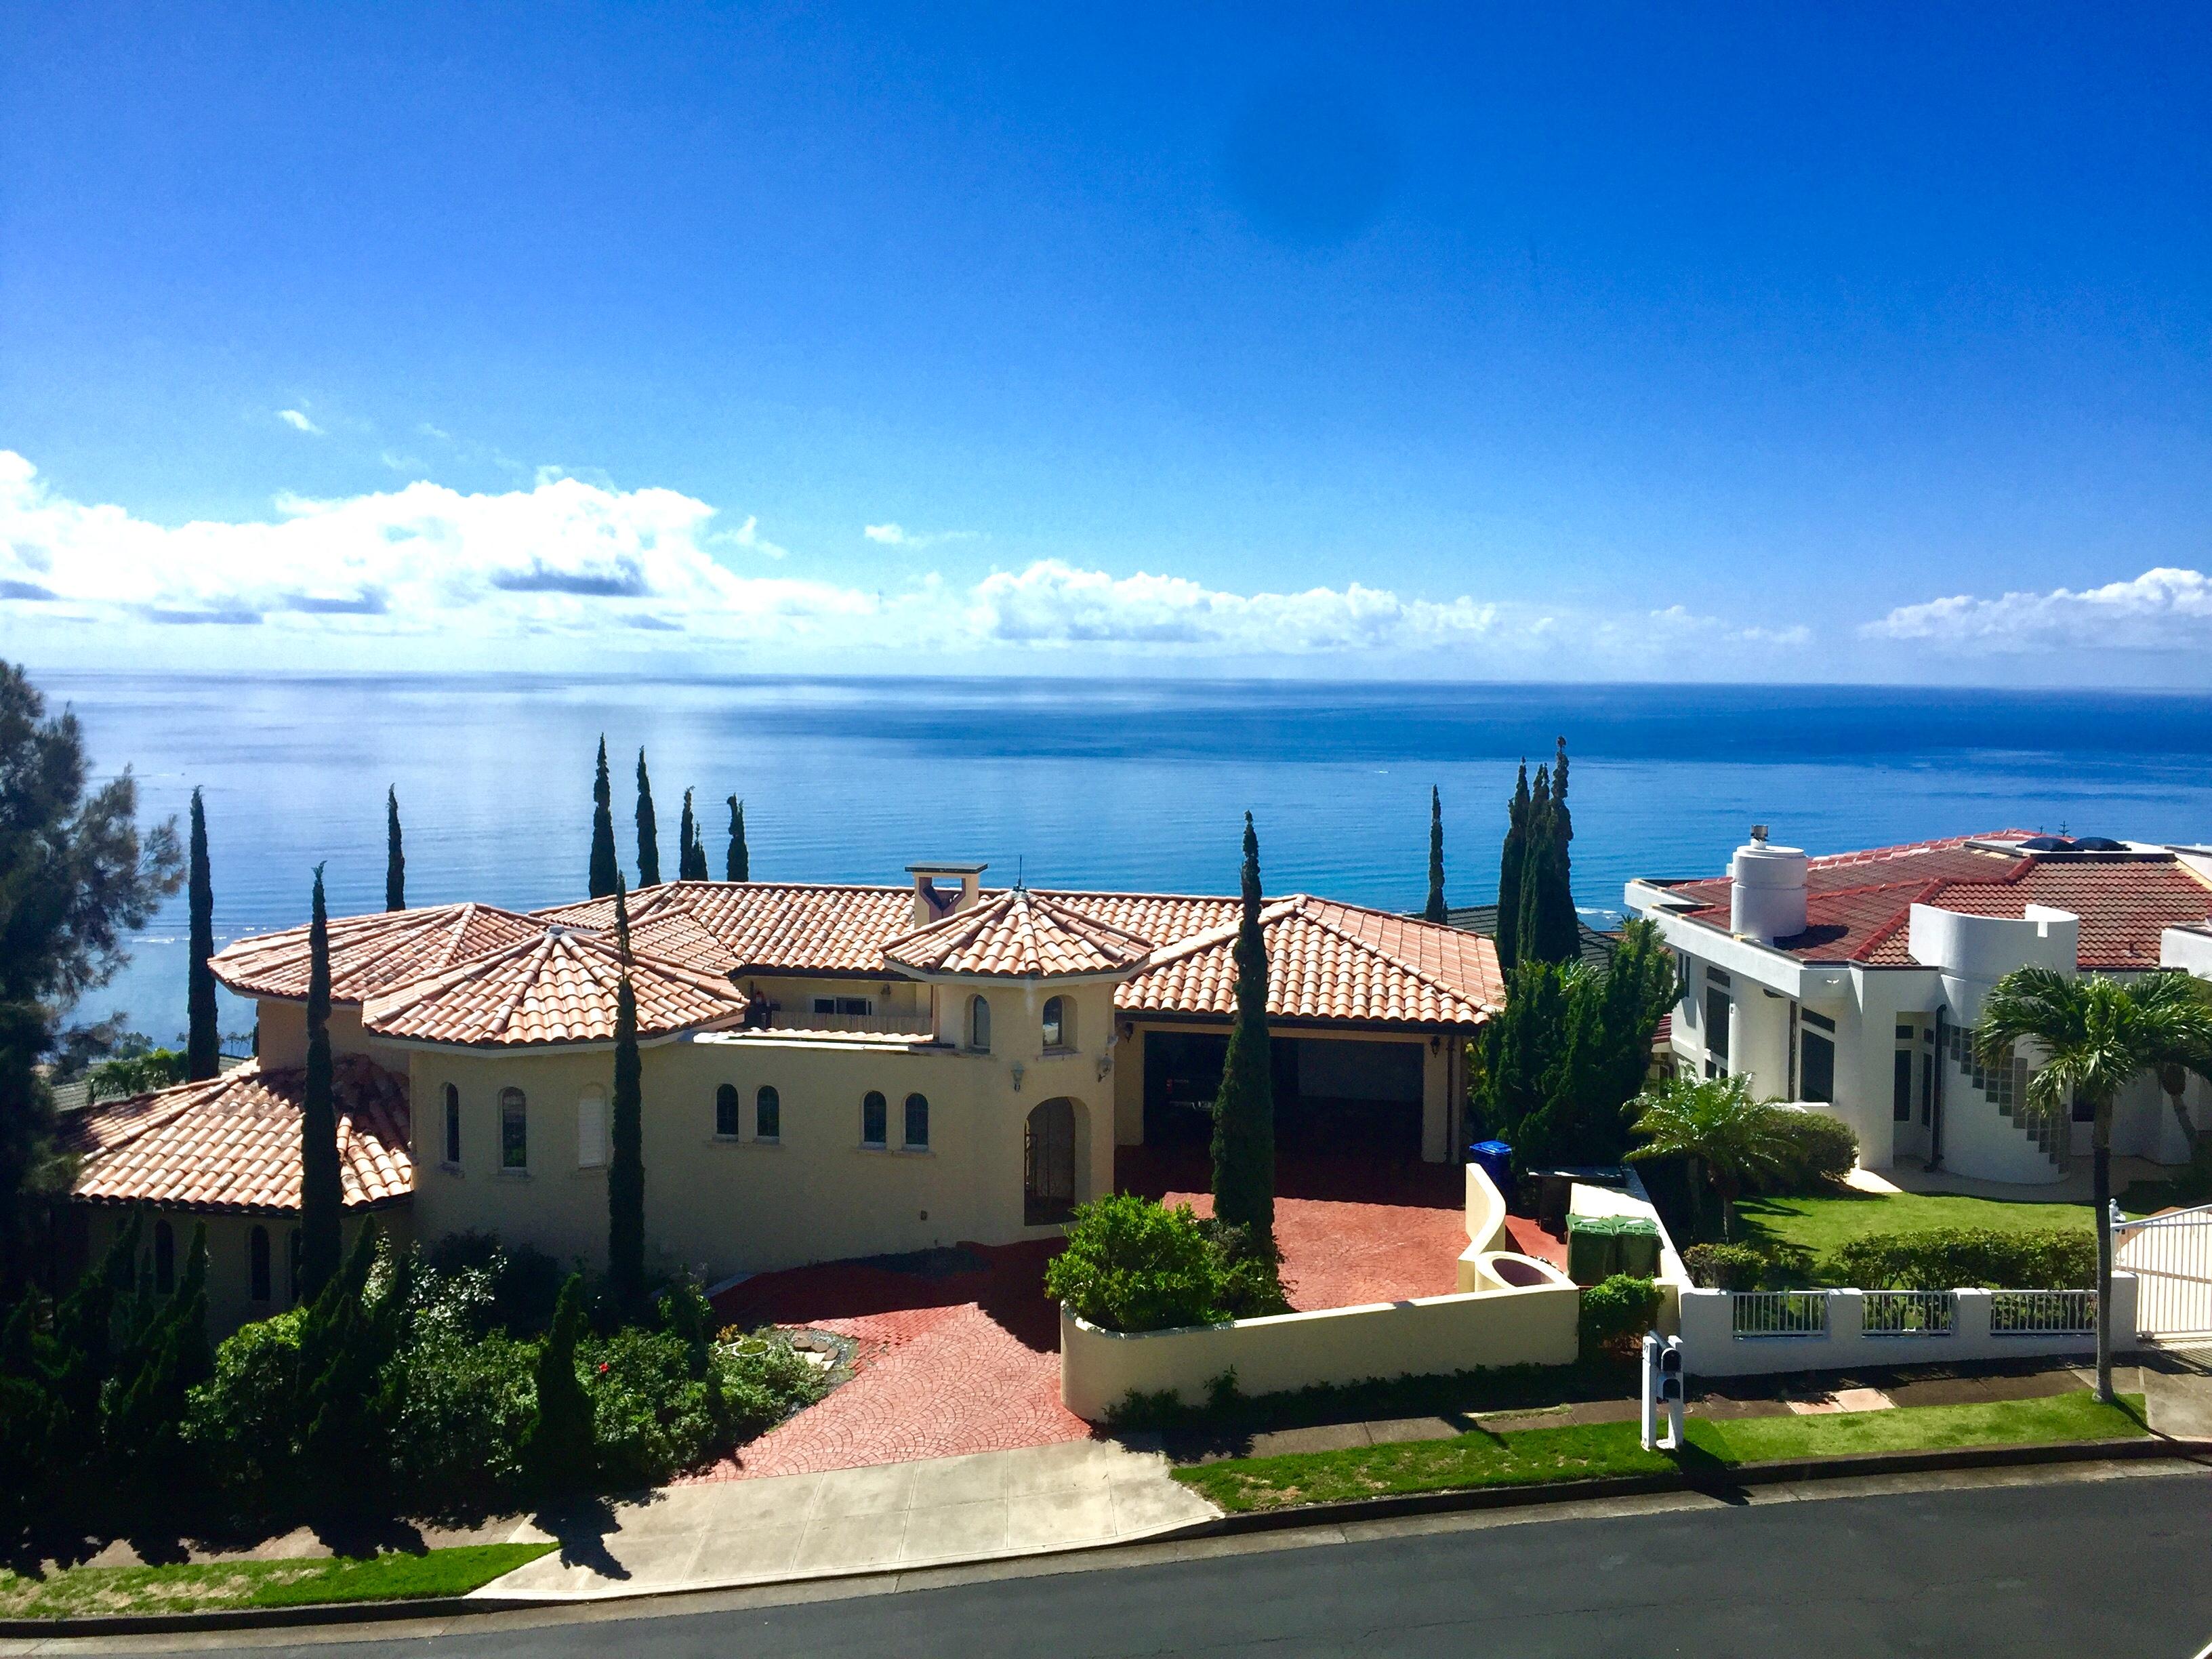 Ocean View from Hawaii Loa Ridge Home